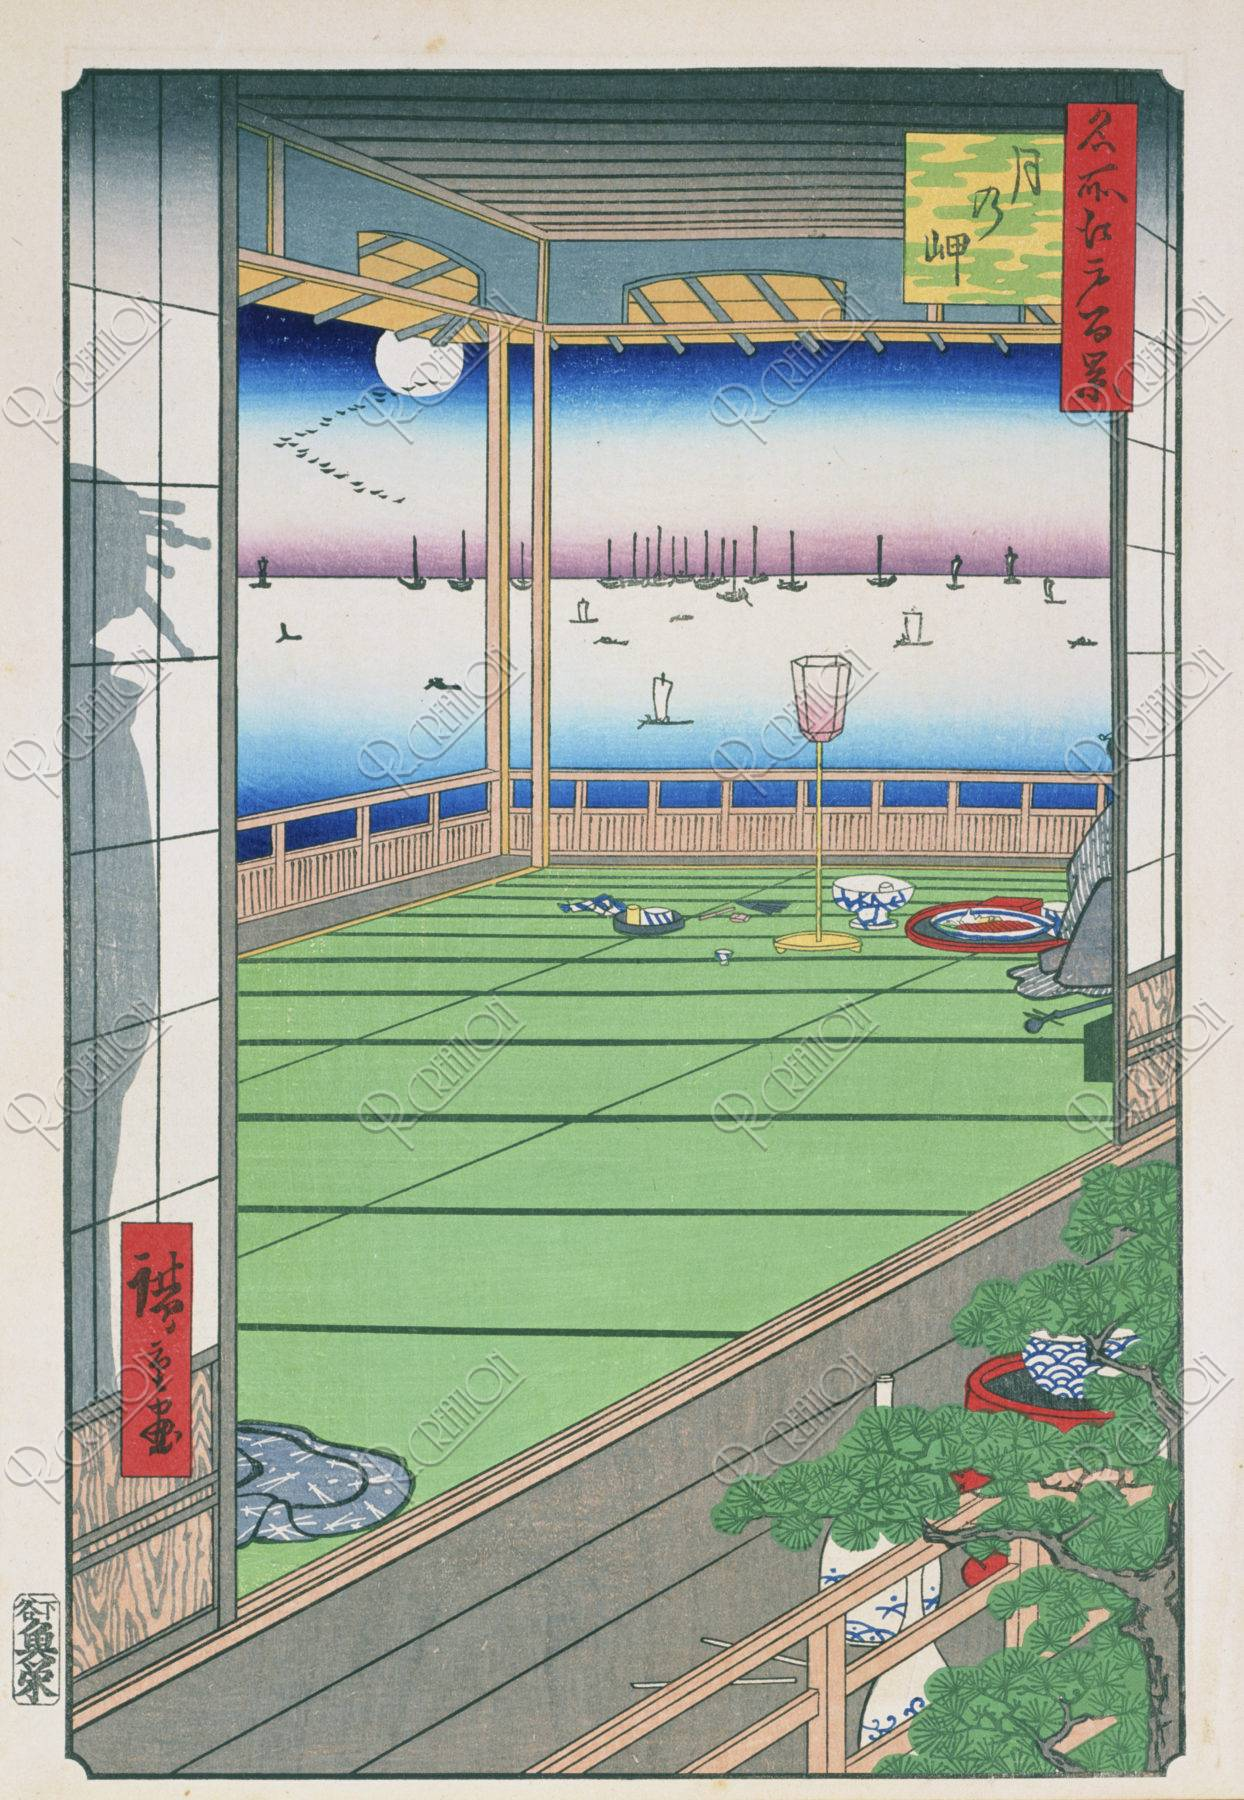 江戸百景 月の岬